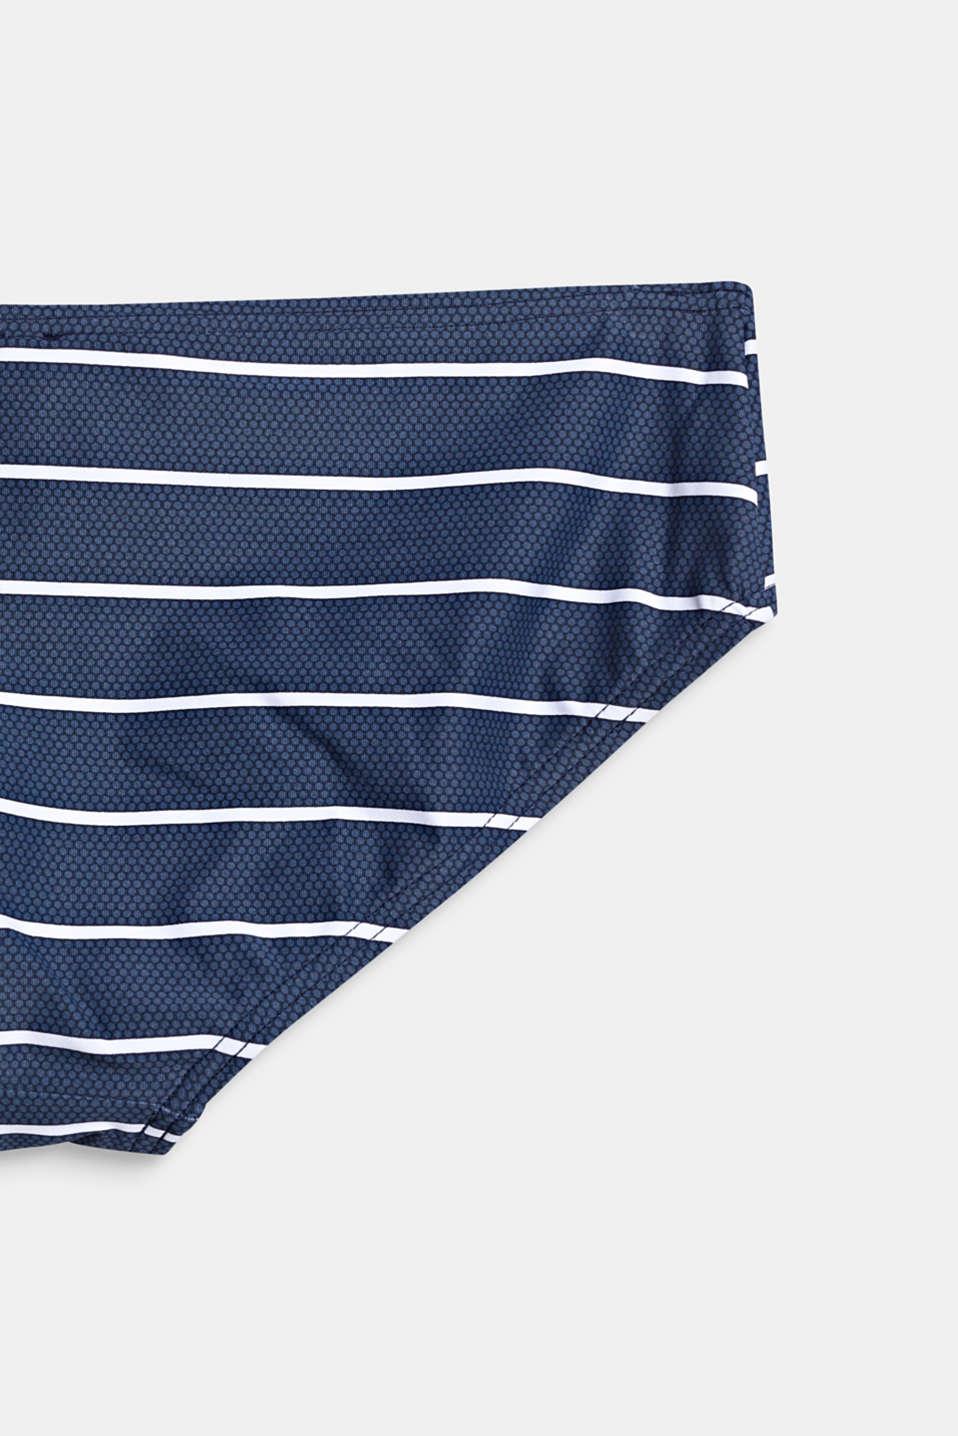 Halterneck bikini set with light padding, DARK BLUE, detail image number 2